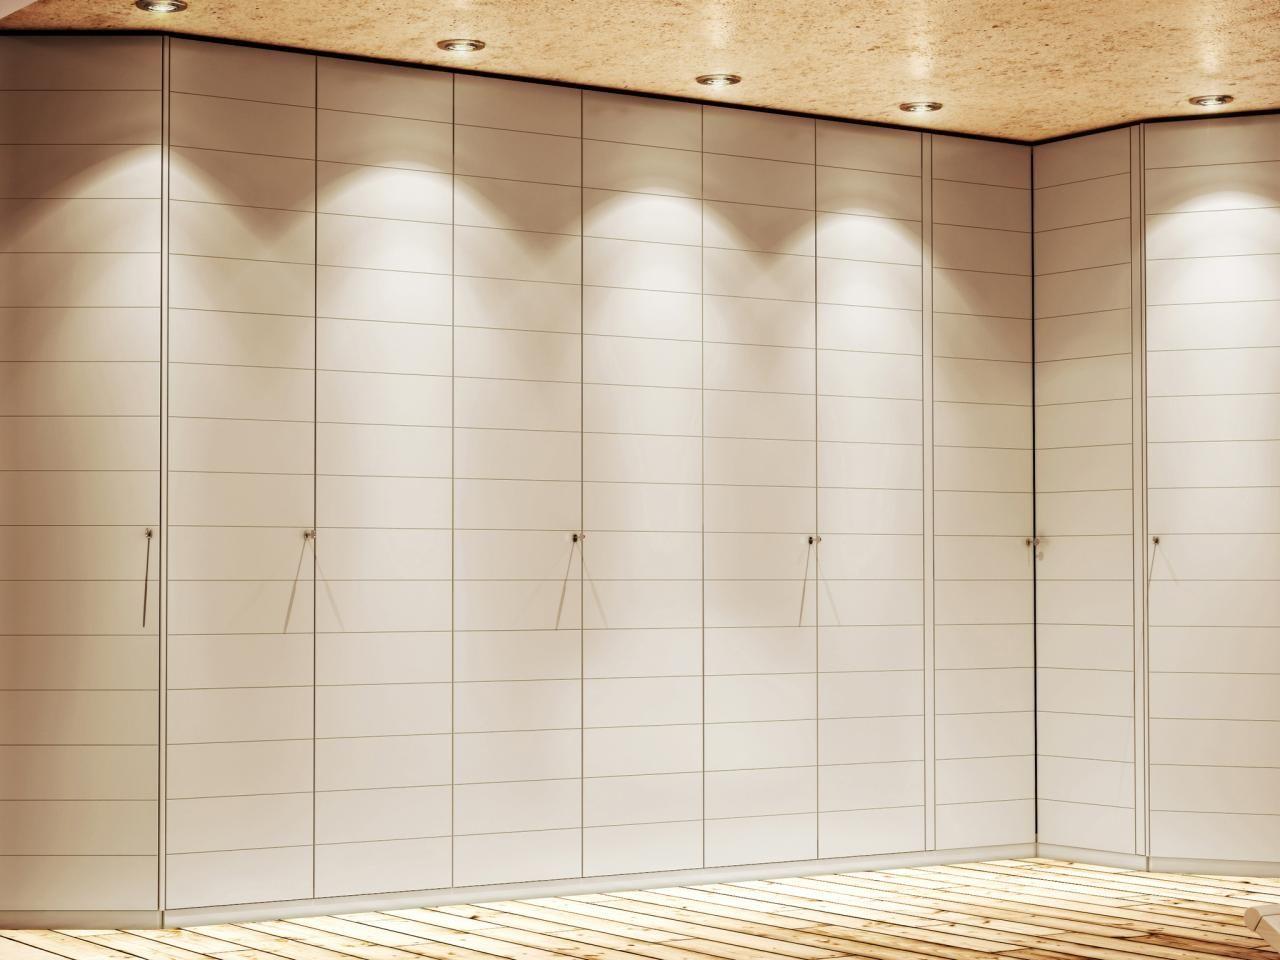 Captivating Sliding Closet Doors: Design Ideas And Options